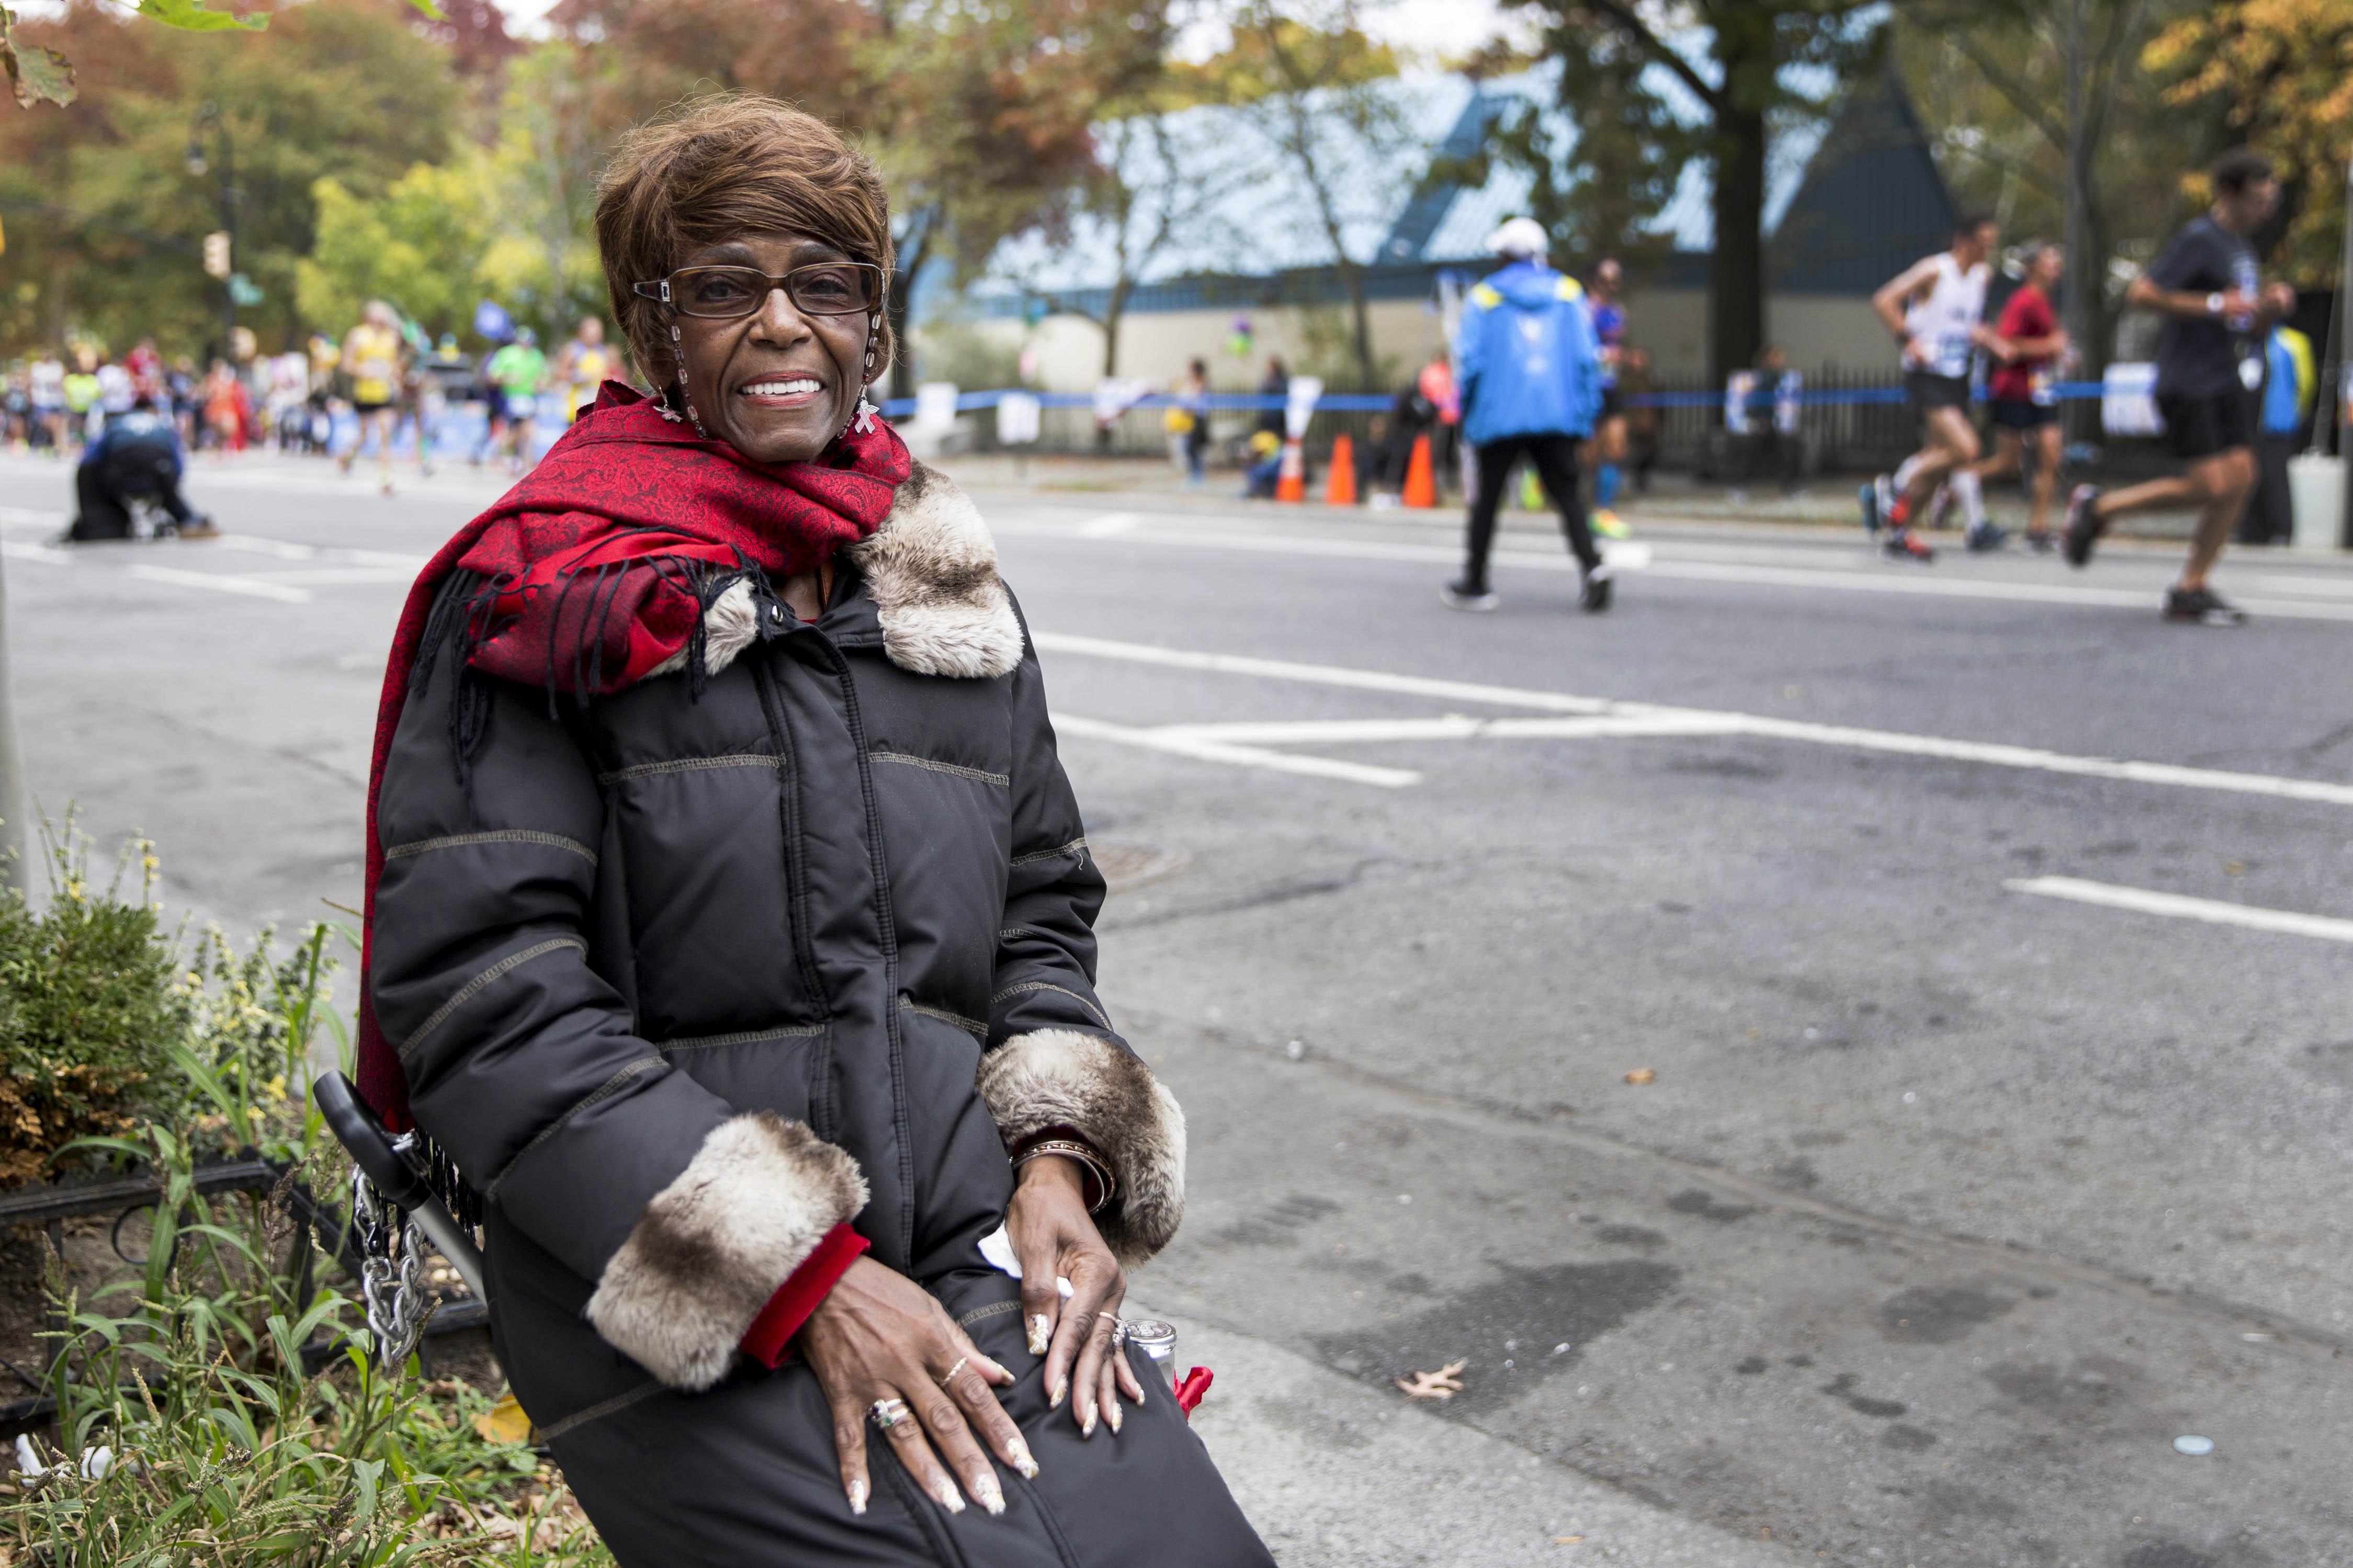 2015 New York City Marathon (Photo by Taylor Baucom/The Players' Tribune)